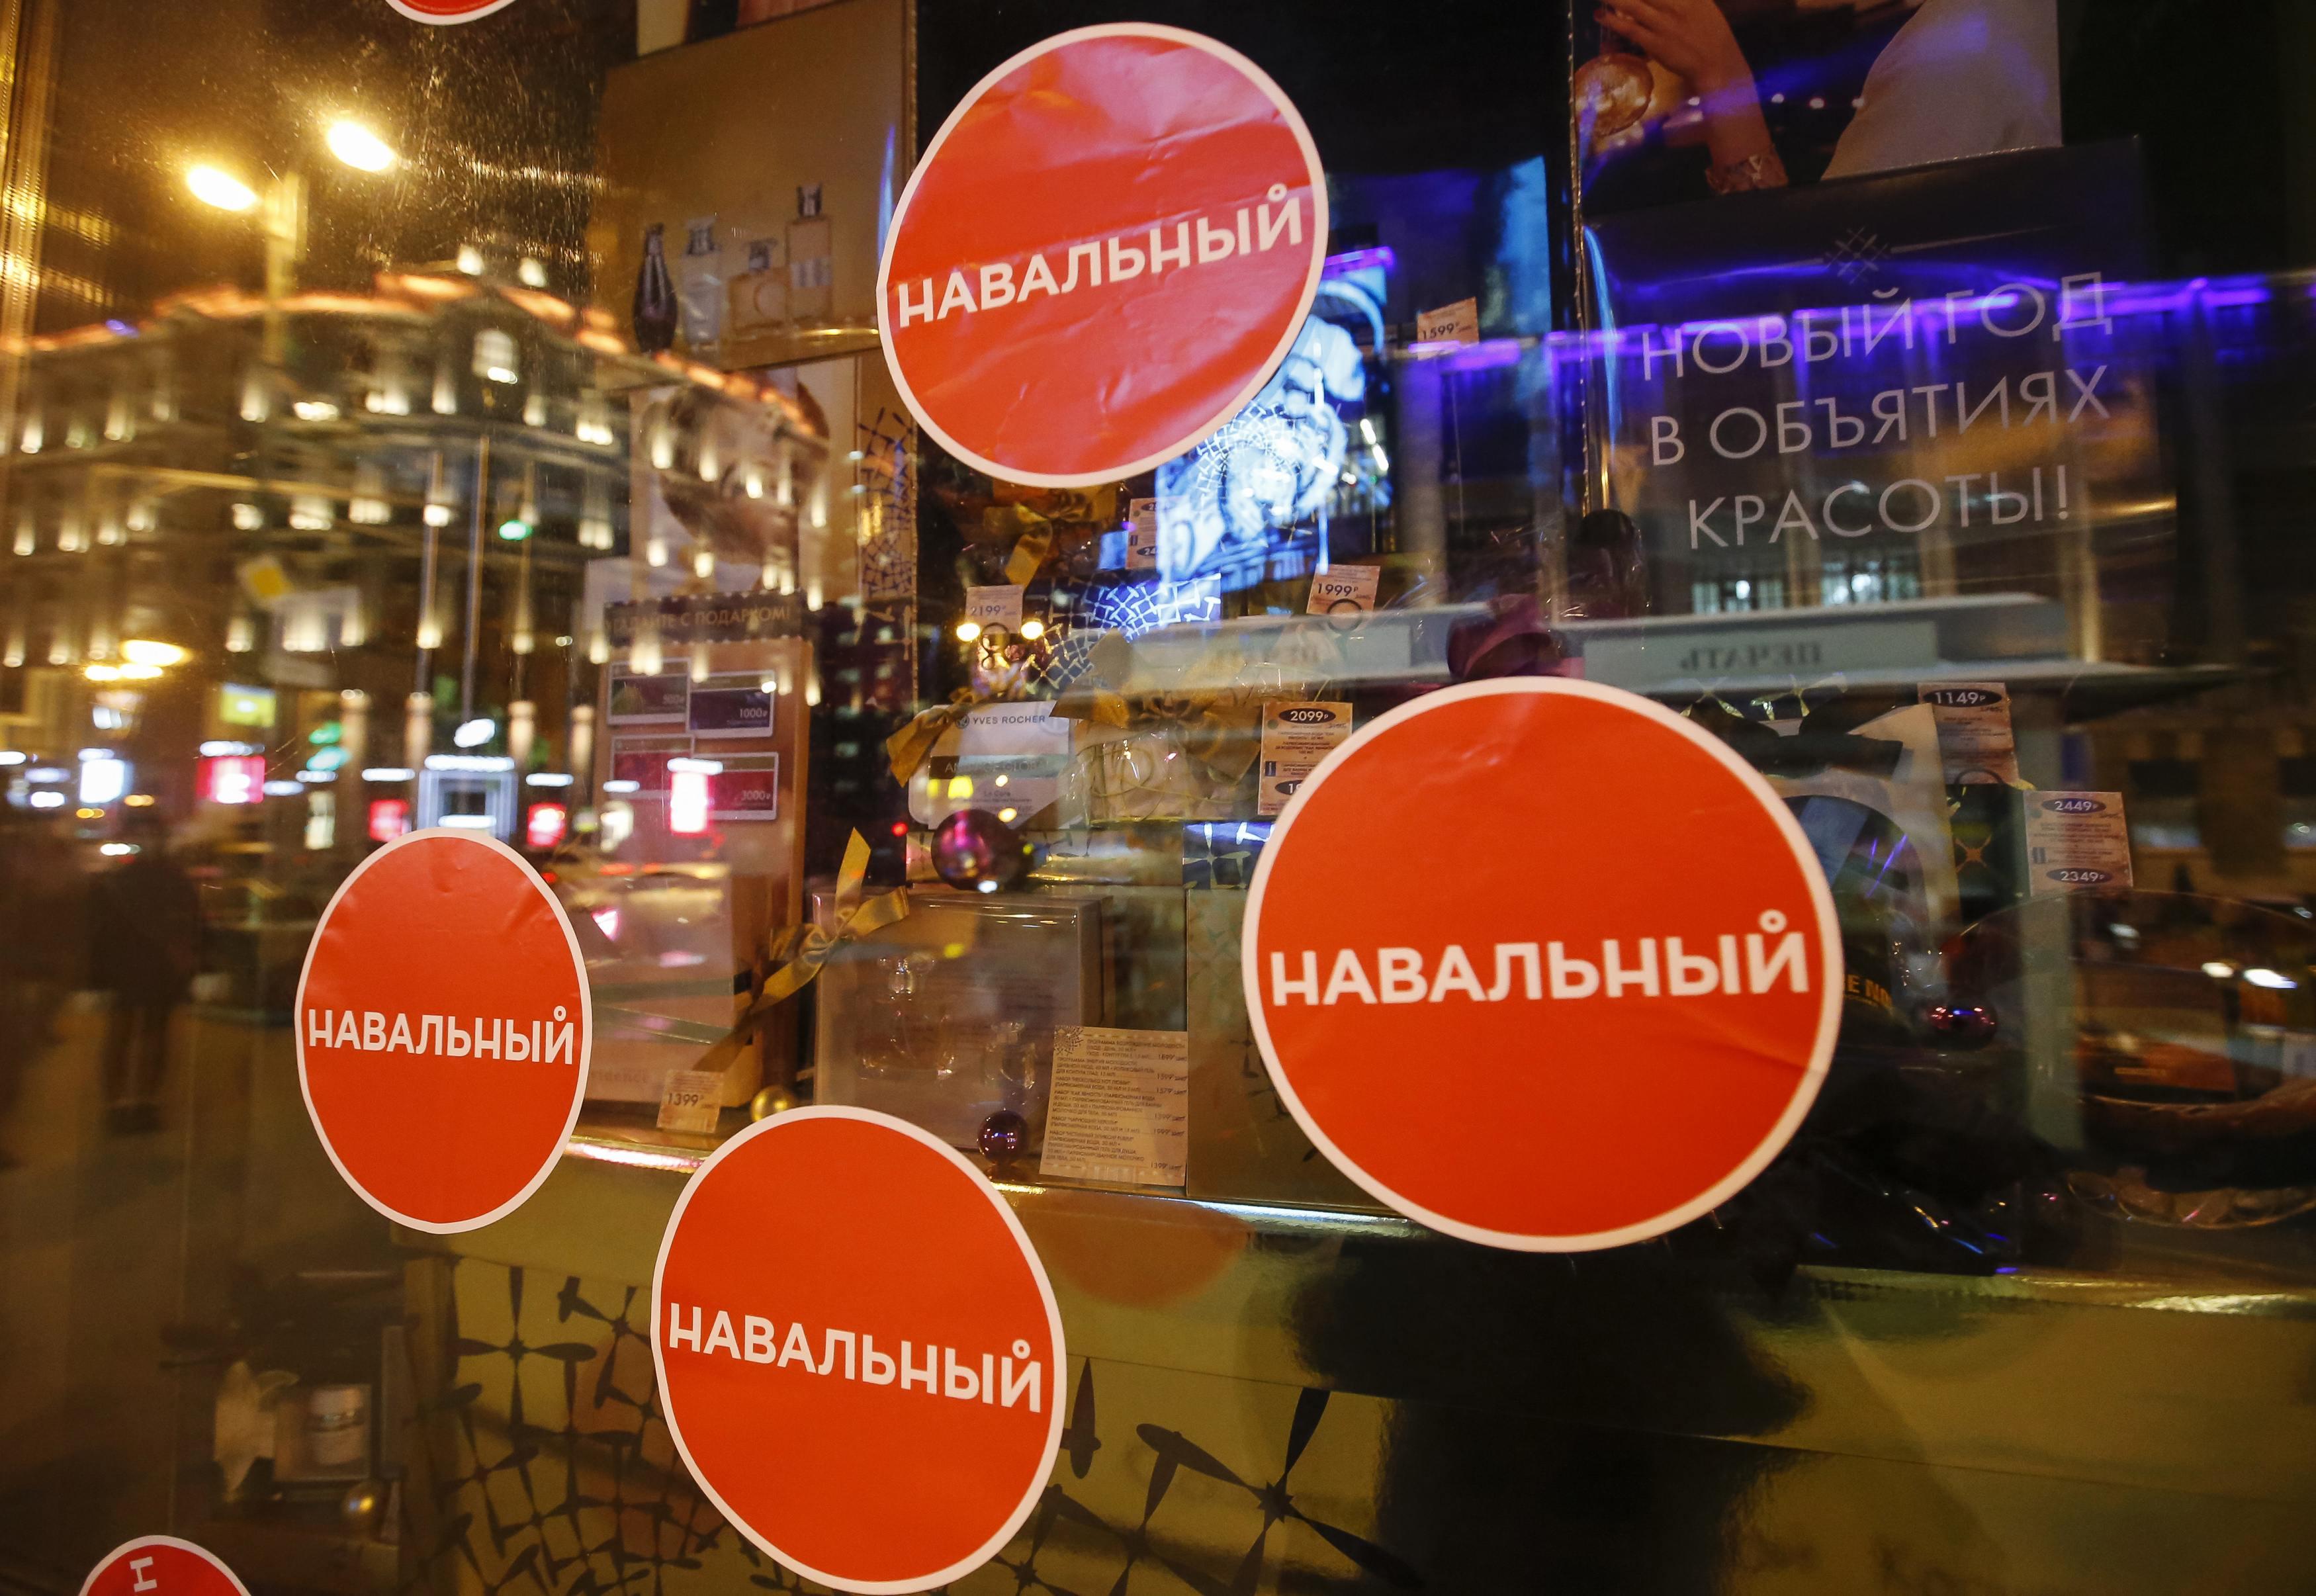 Акция протеста в Москве, иллюстрация